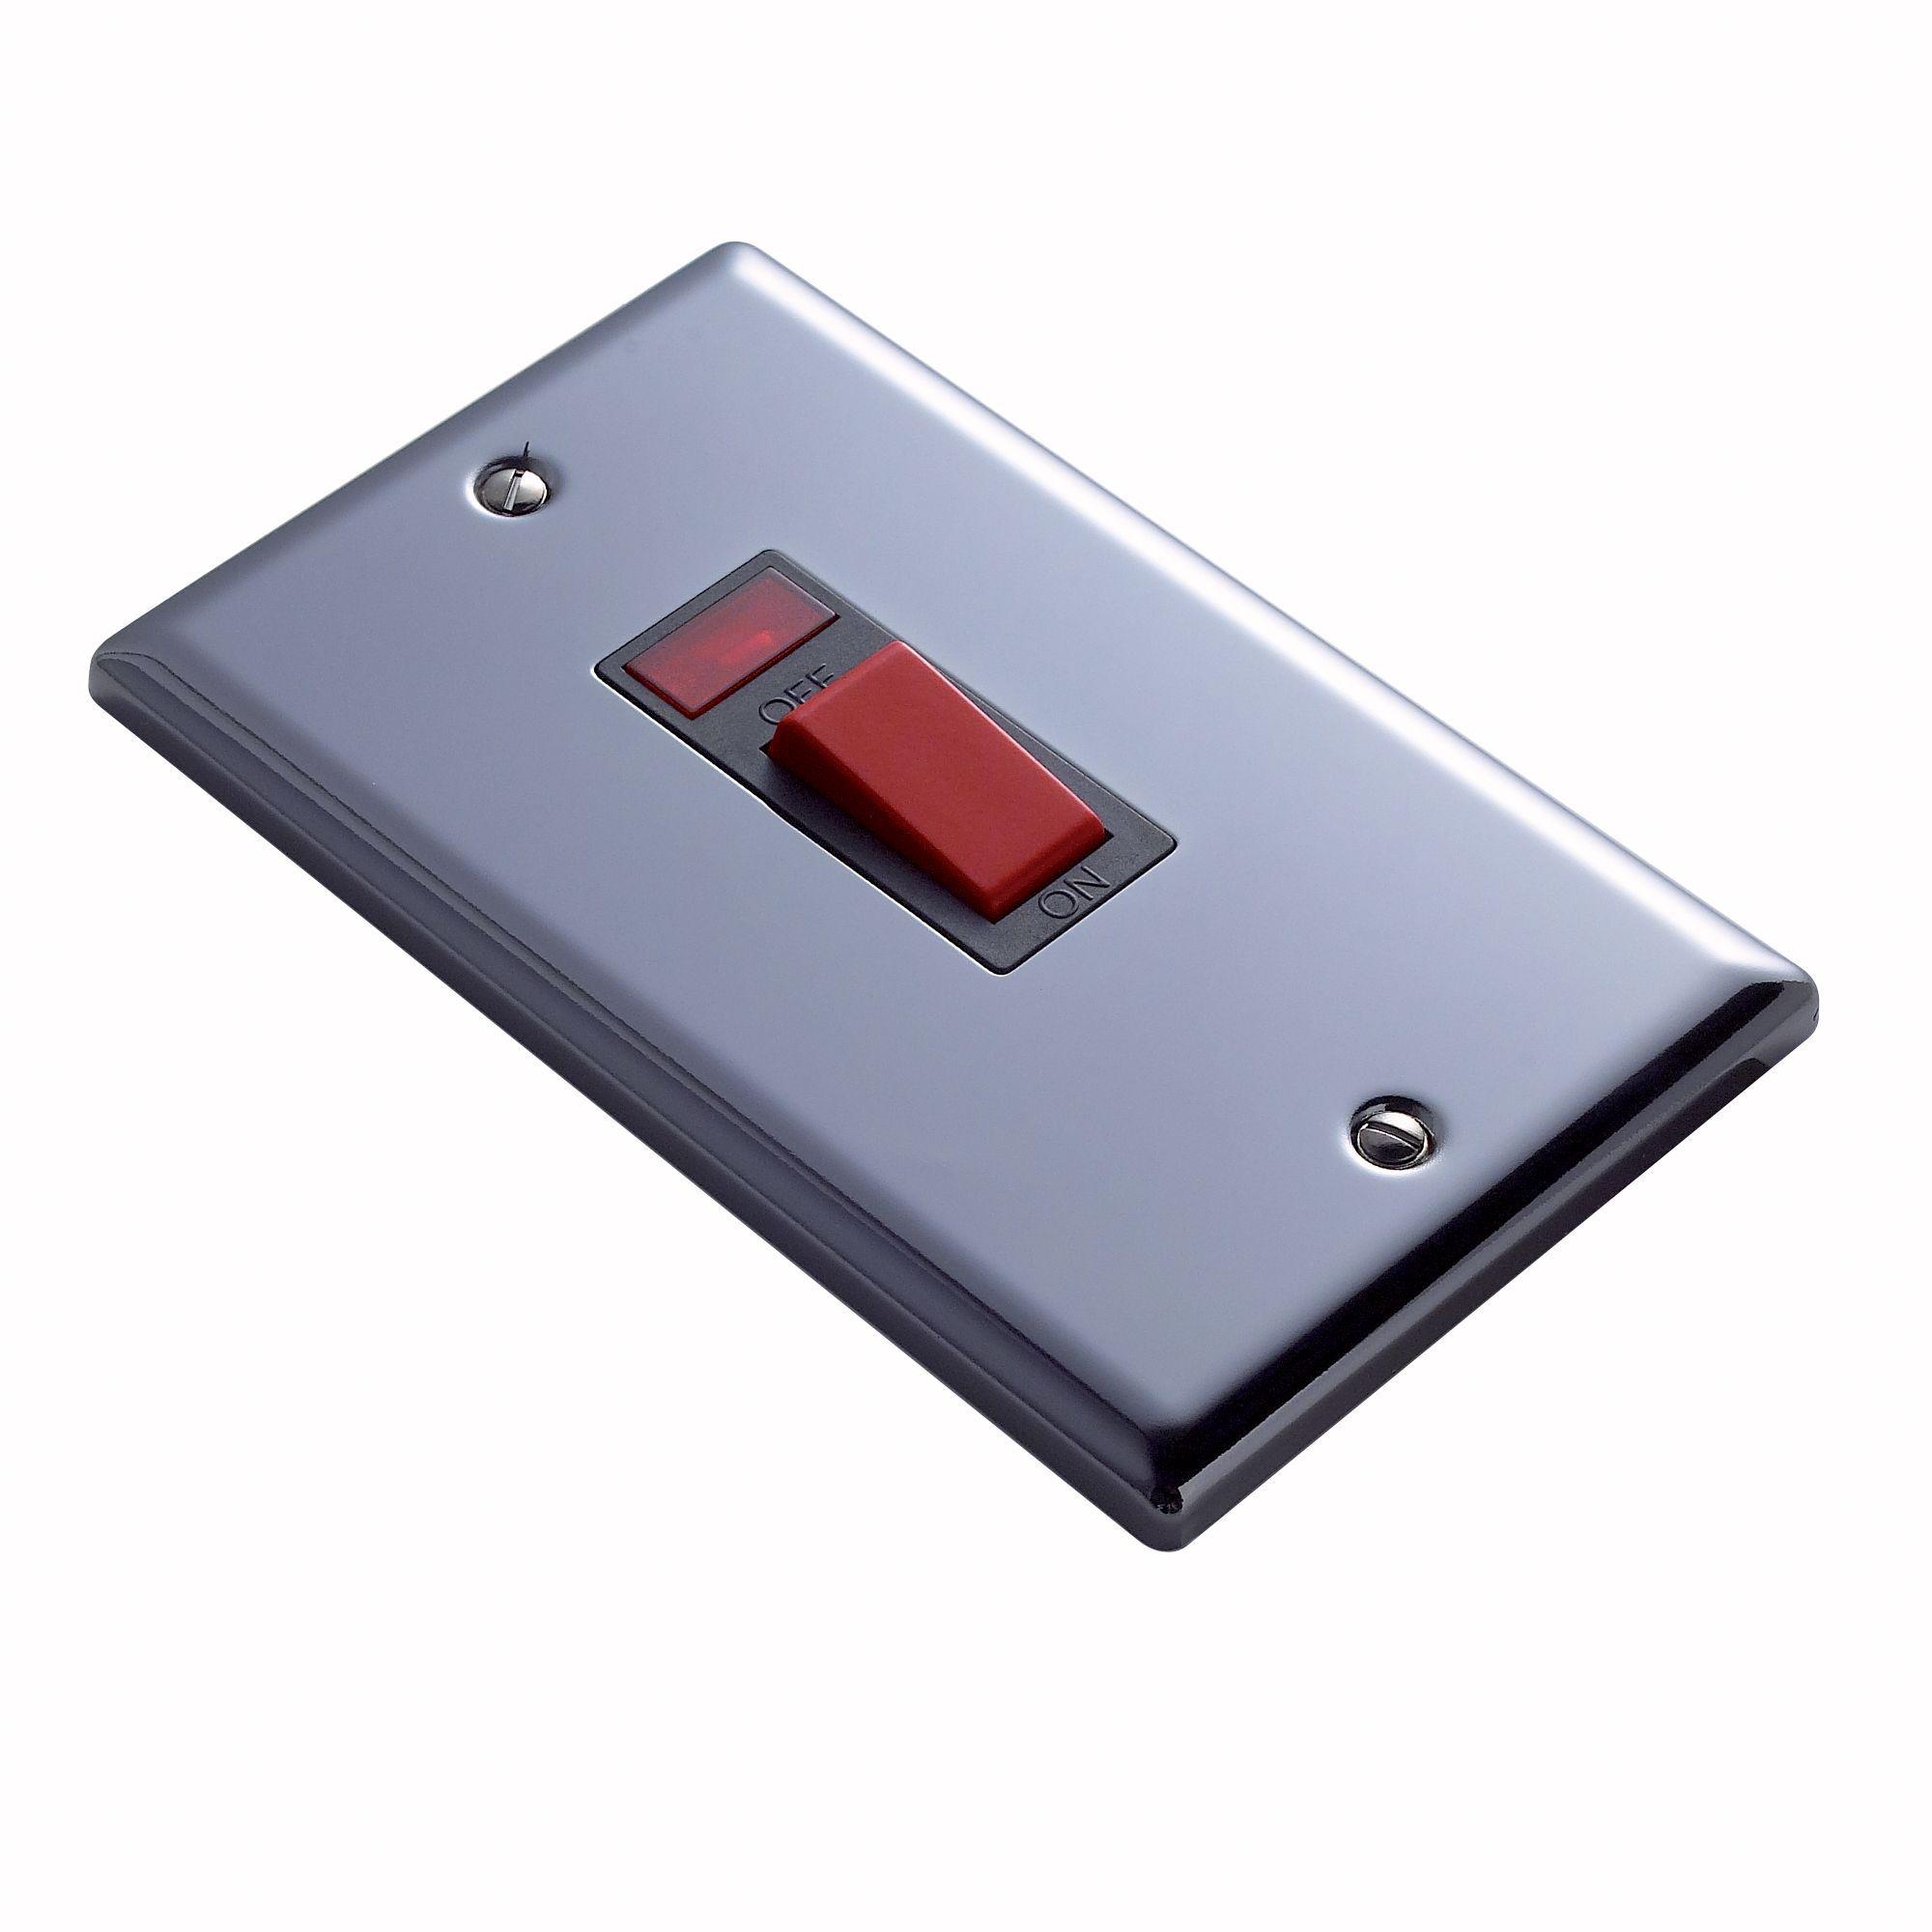 Volex 45a Double Pole Black/iridium Cooker Switch